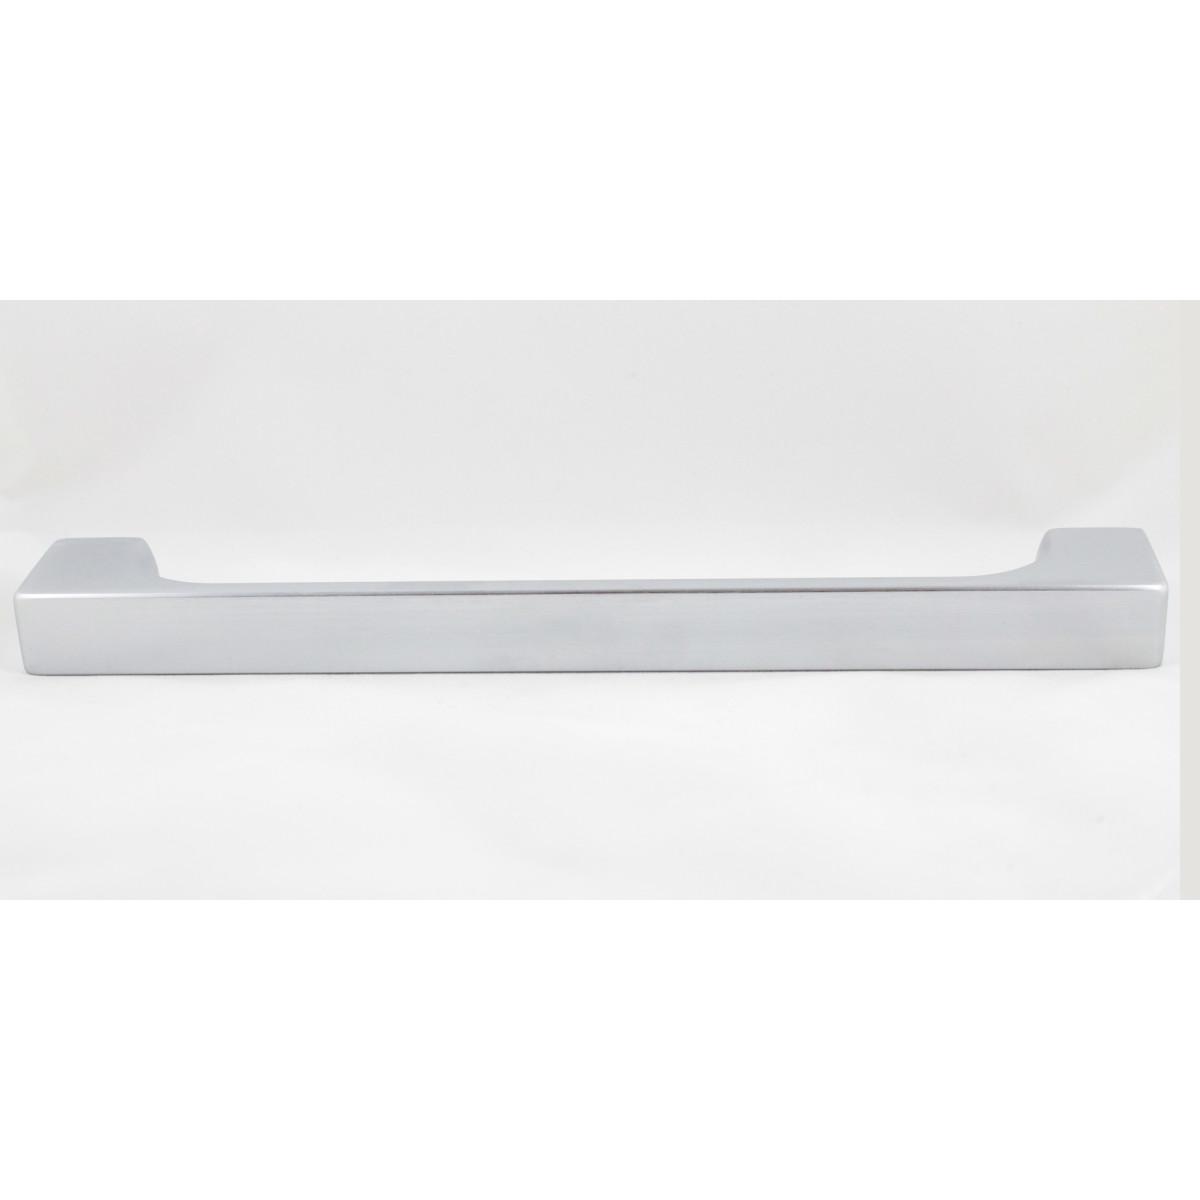 Ручка-Скоба Modda 320 Латунь Хром Pizza-830-88-320